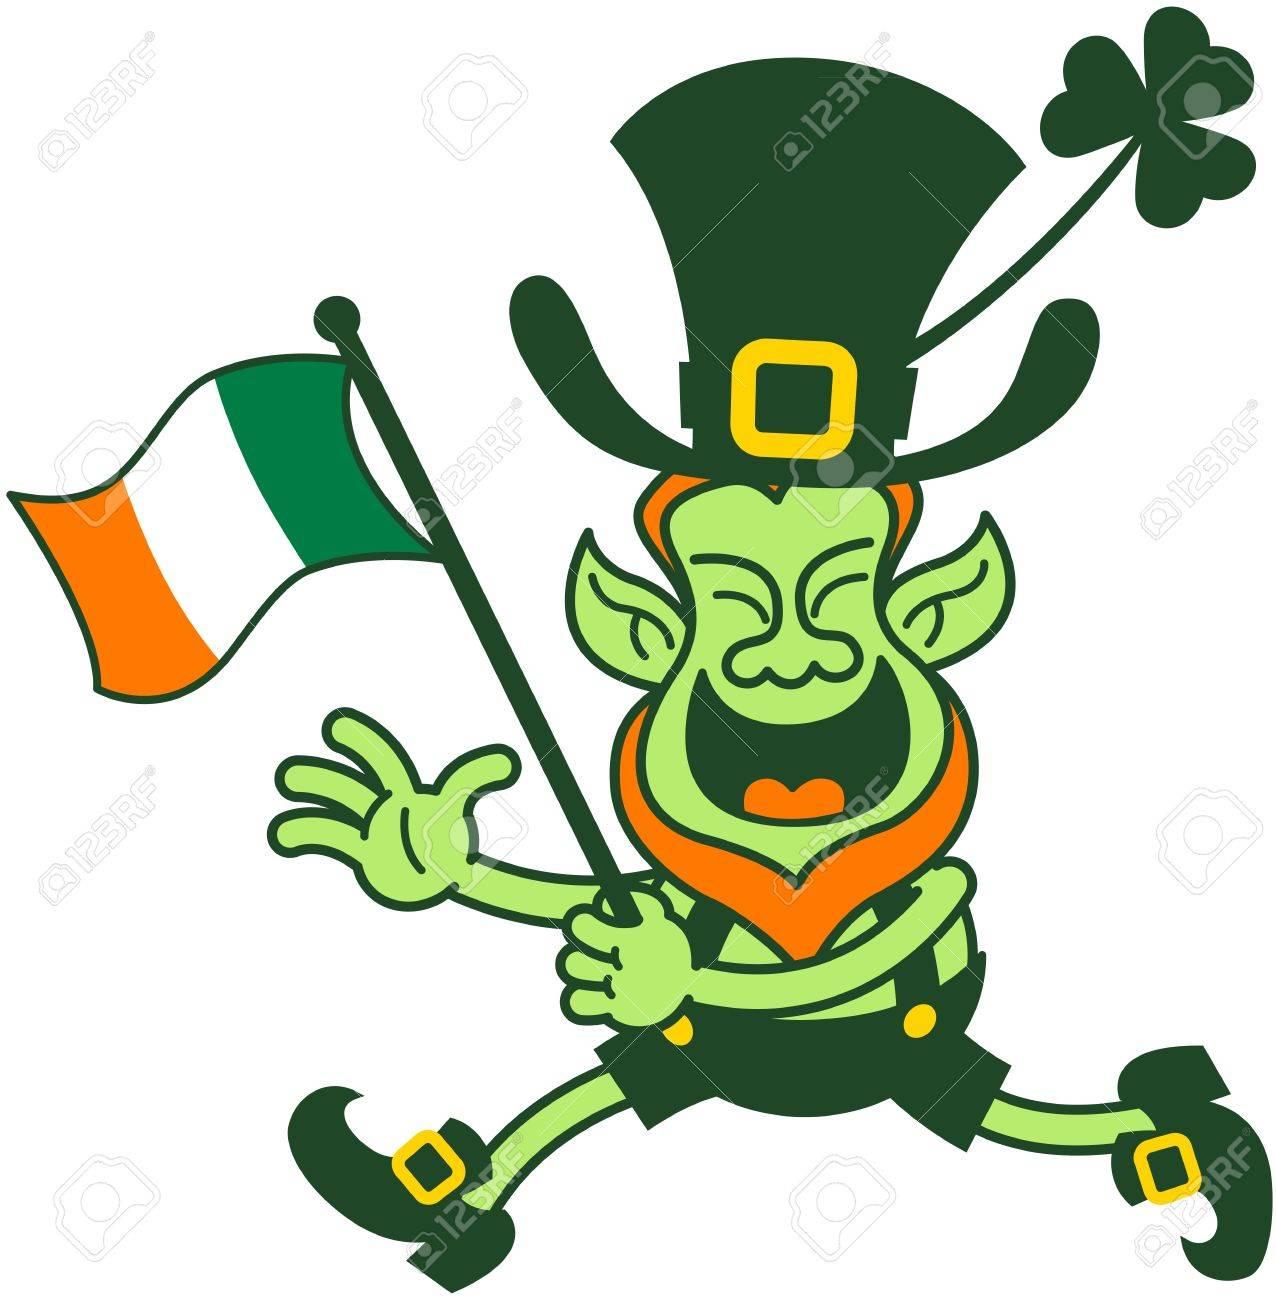 Green Leprechaun Running And Waving An Irish Flag To Celebrate ...